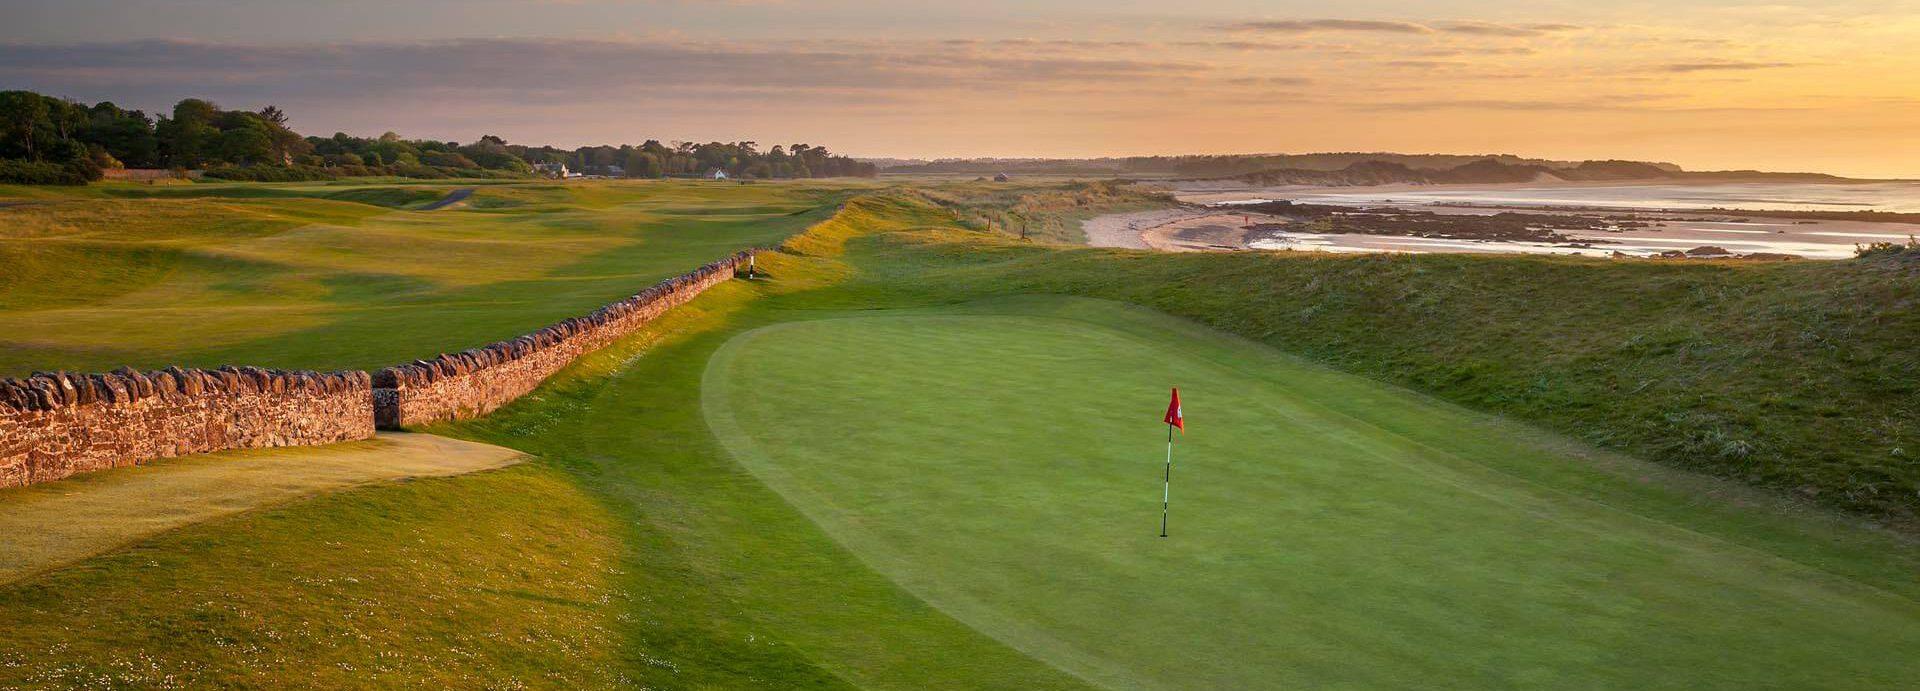 bespoke golf experiences